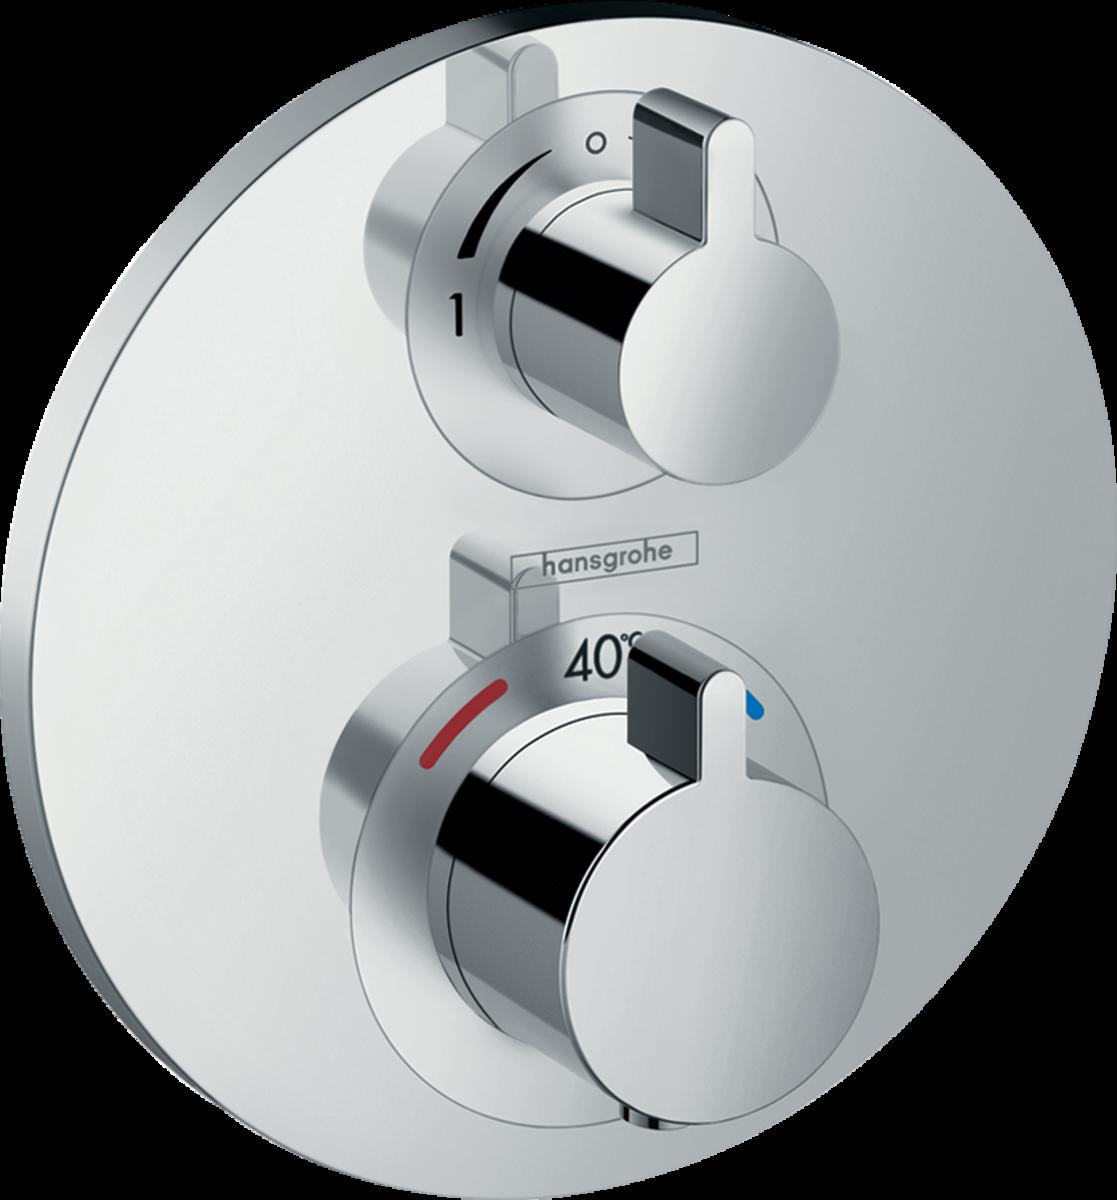 Thermostat für AP Ecostat 1001 S Hansgrohe Griff